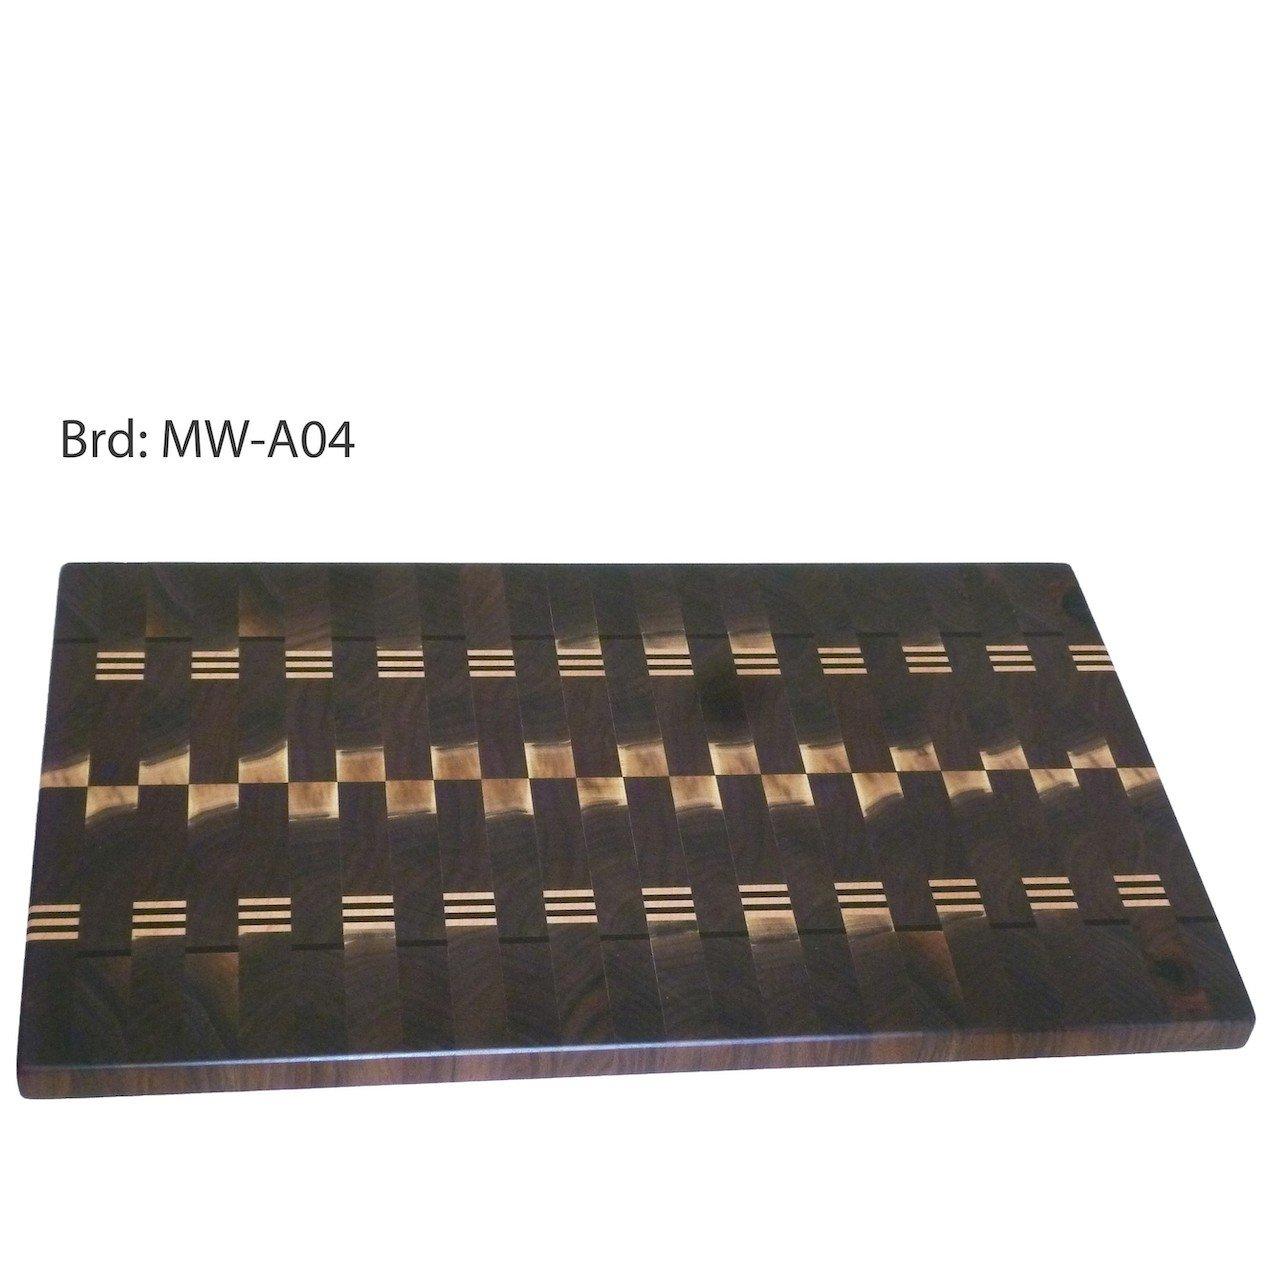 MW-A04